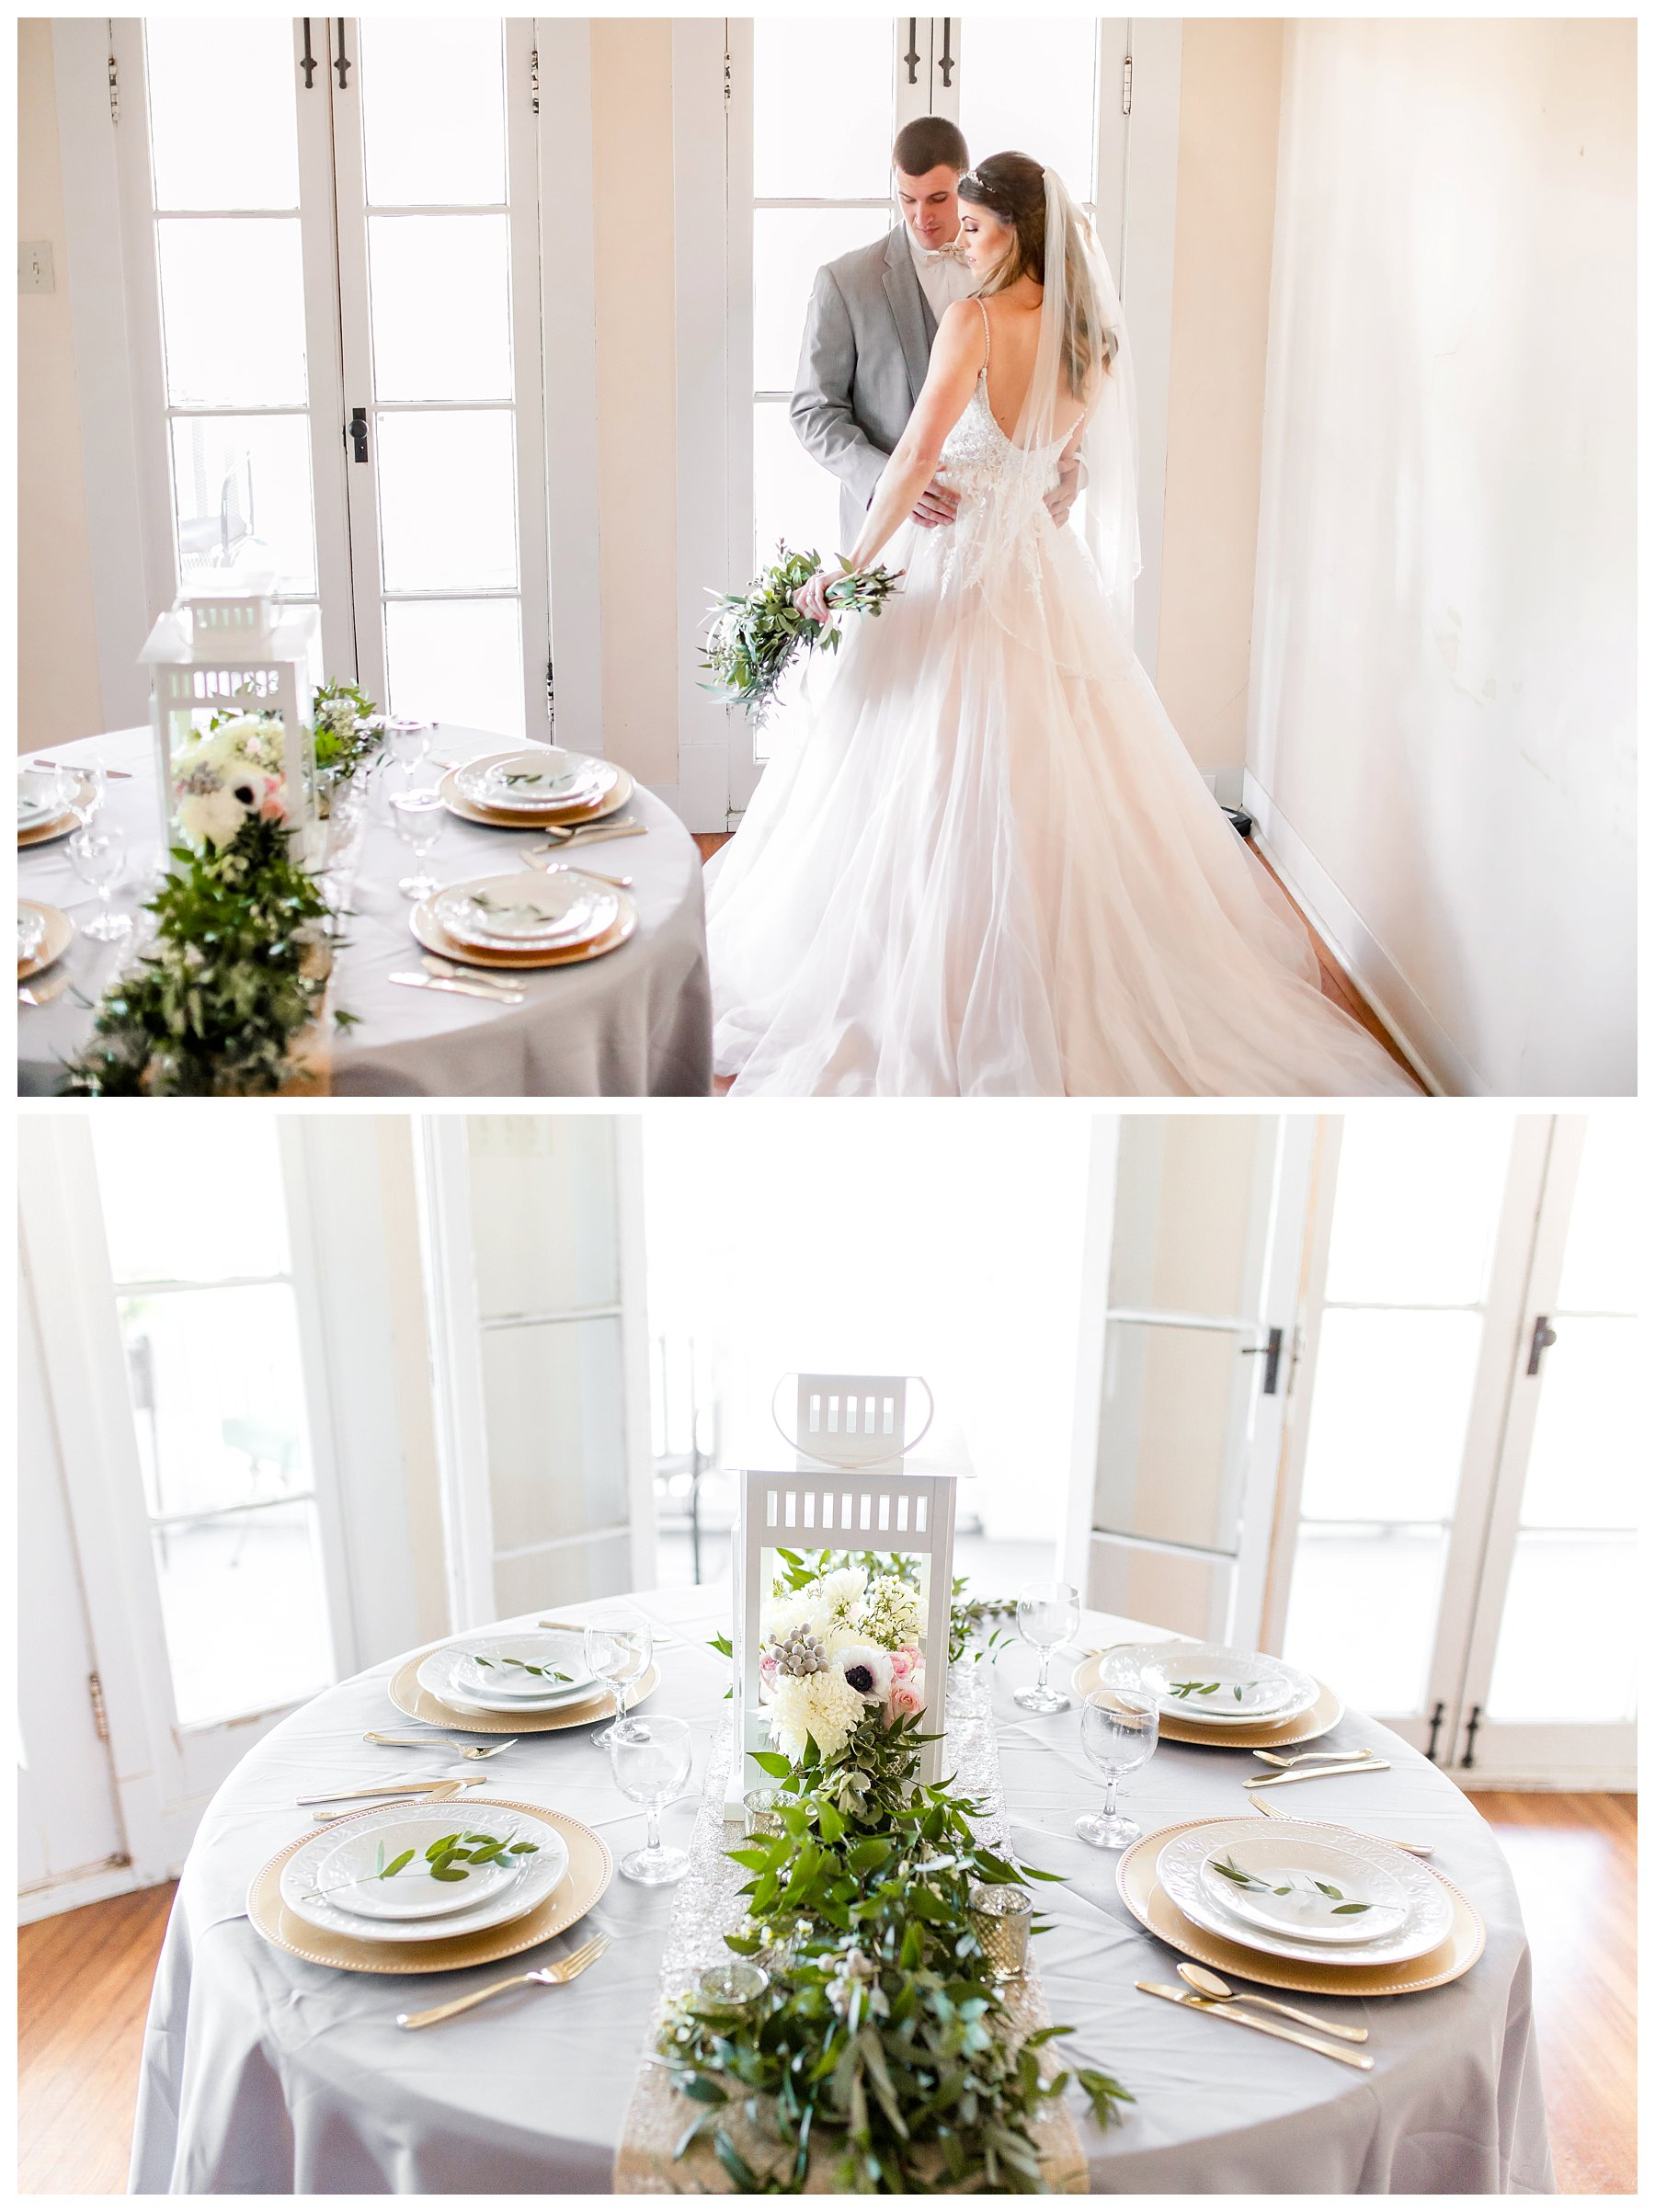 photographer_wedding_saint_louis_Kansas_City_Photography_Videography_workshop_training_styled_engagement_Lake_Ozark_KC_MO_STL_Rolla_Hermann_Saint_James_0404.jpg